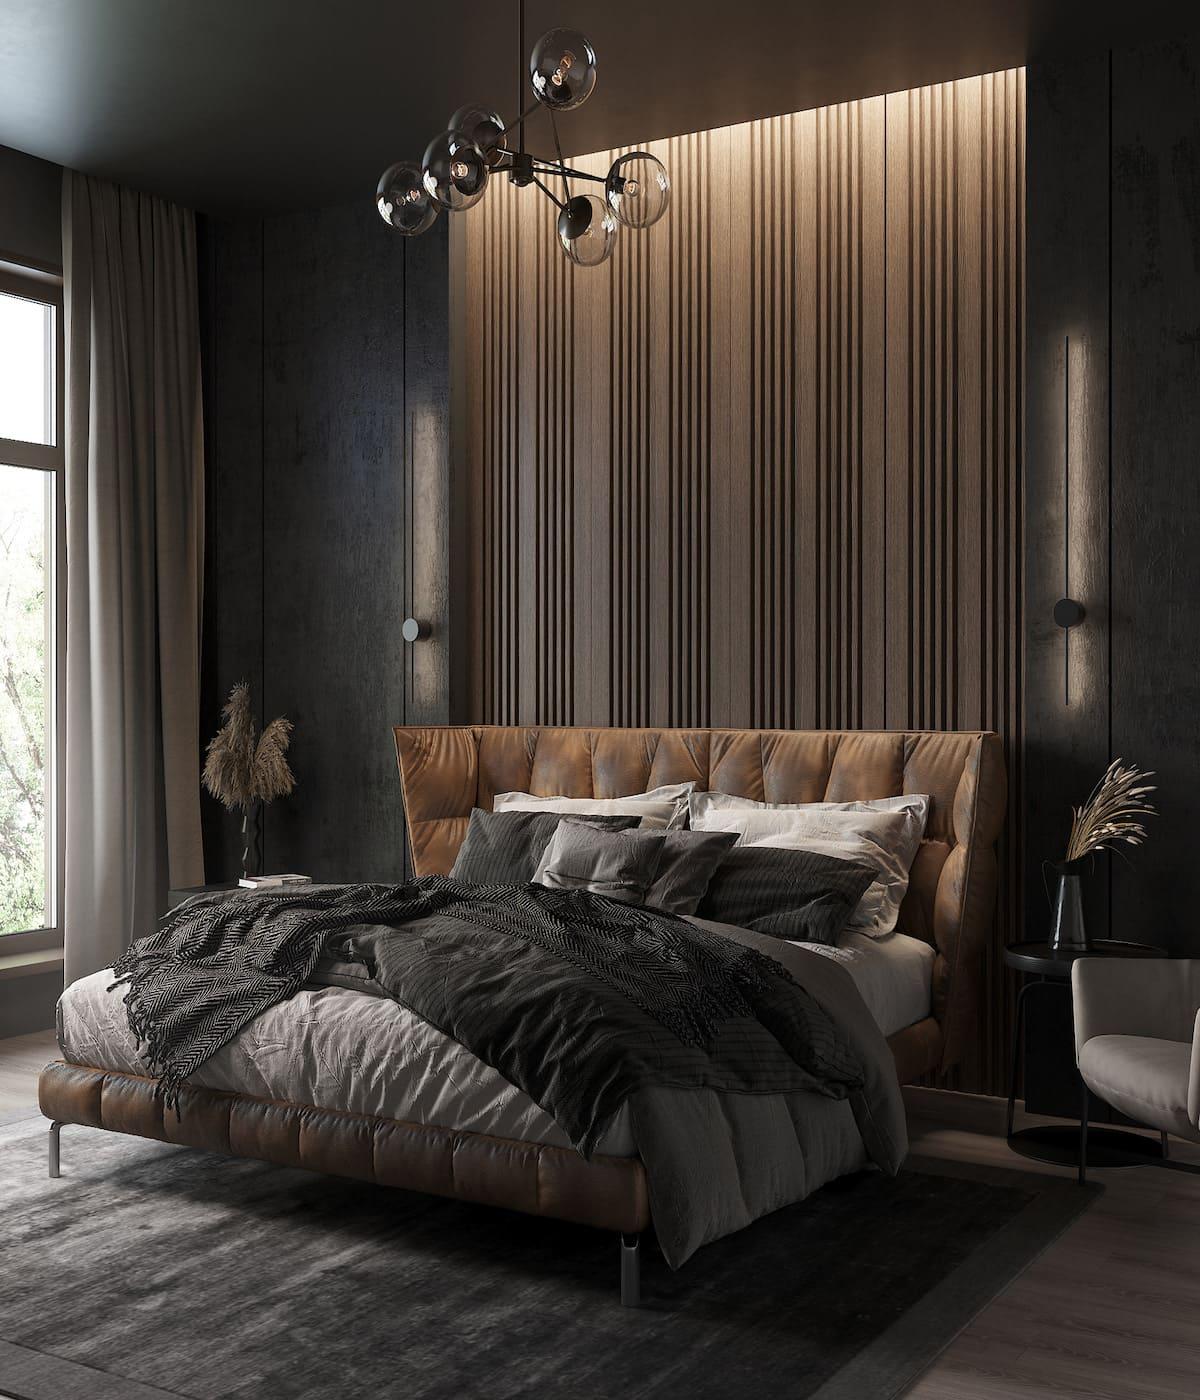 интерьер спальни фото 22